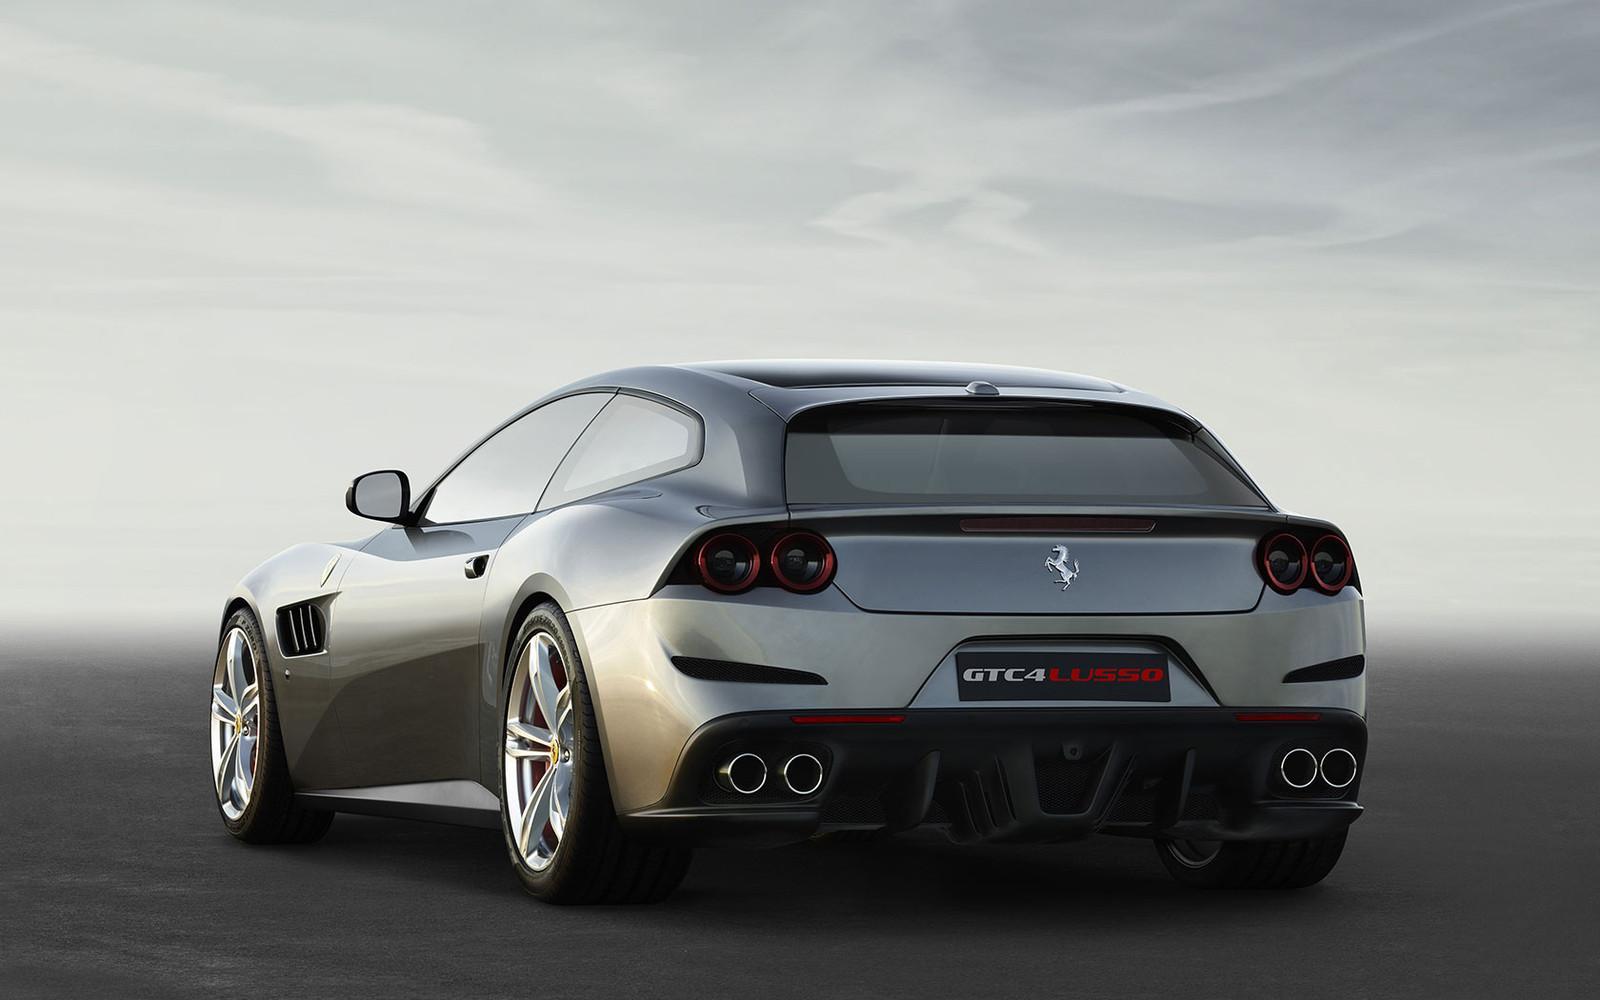 Ferrari Purosangue Suv Detailed For 2022 Slashgear